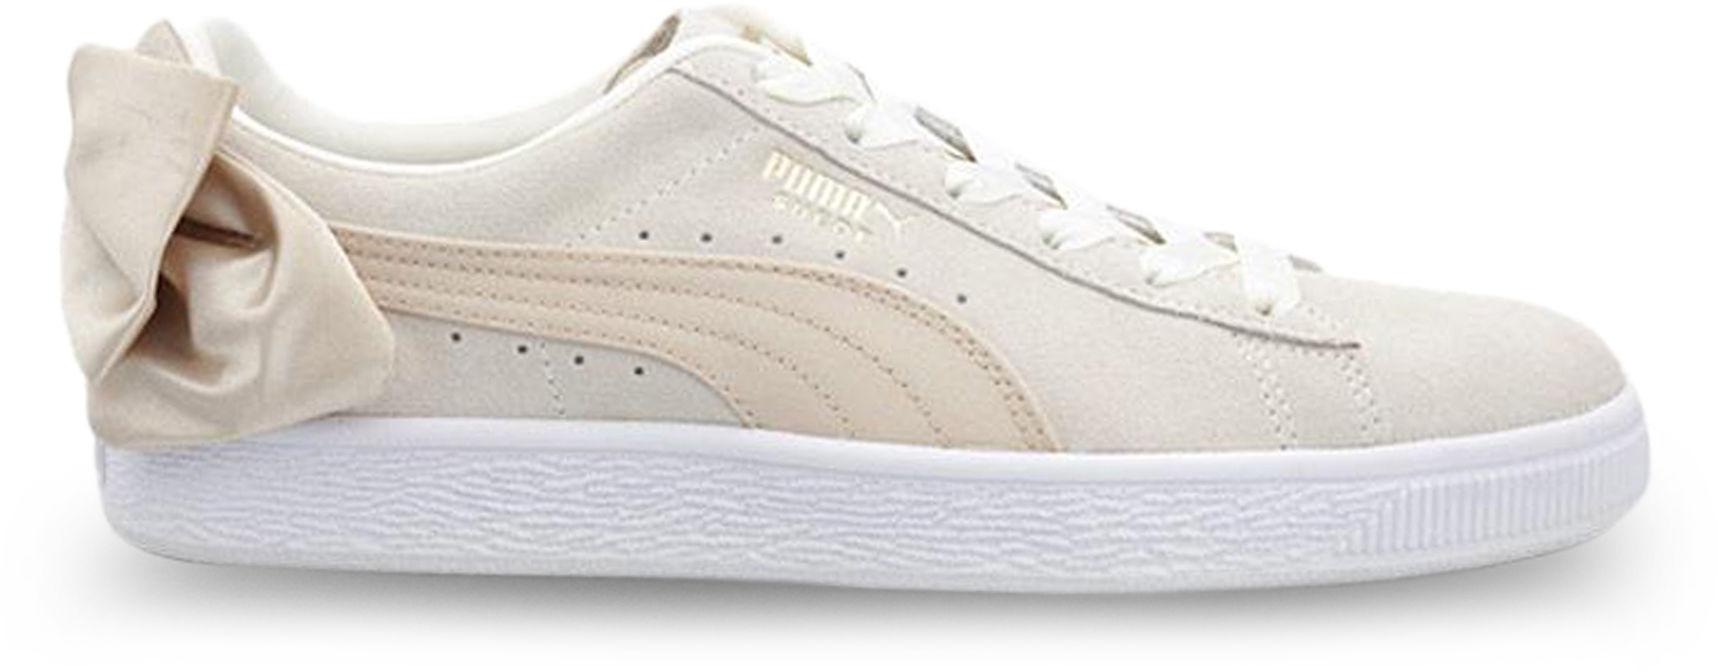 Puma Sneakers Kobiety